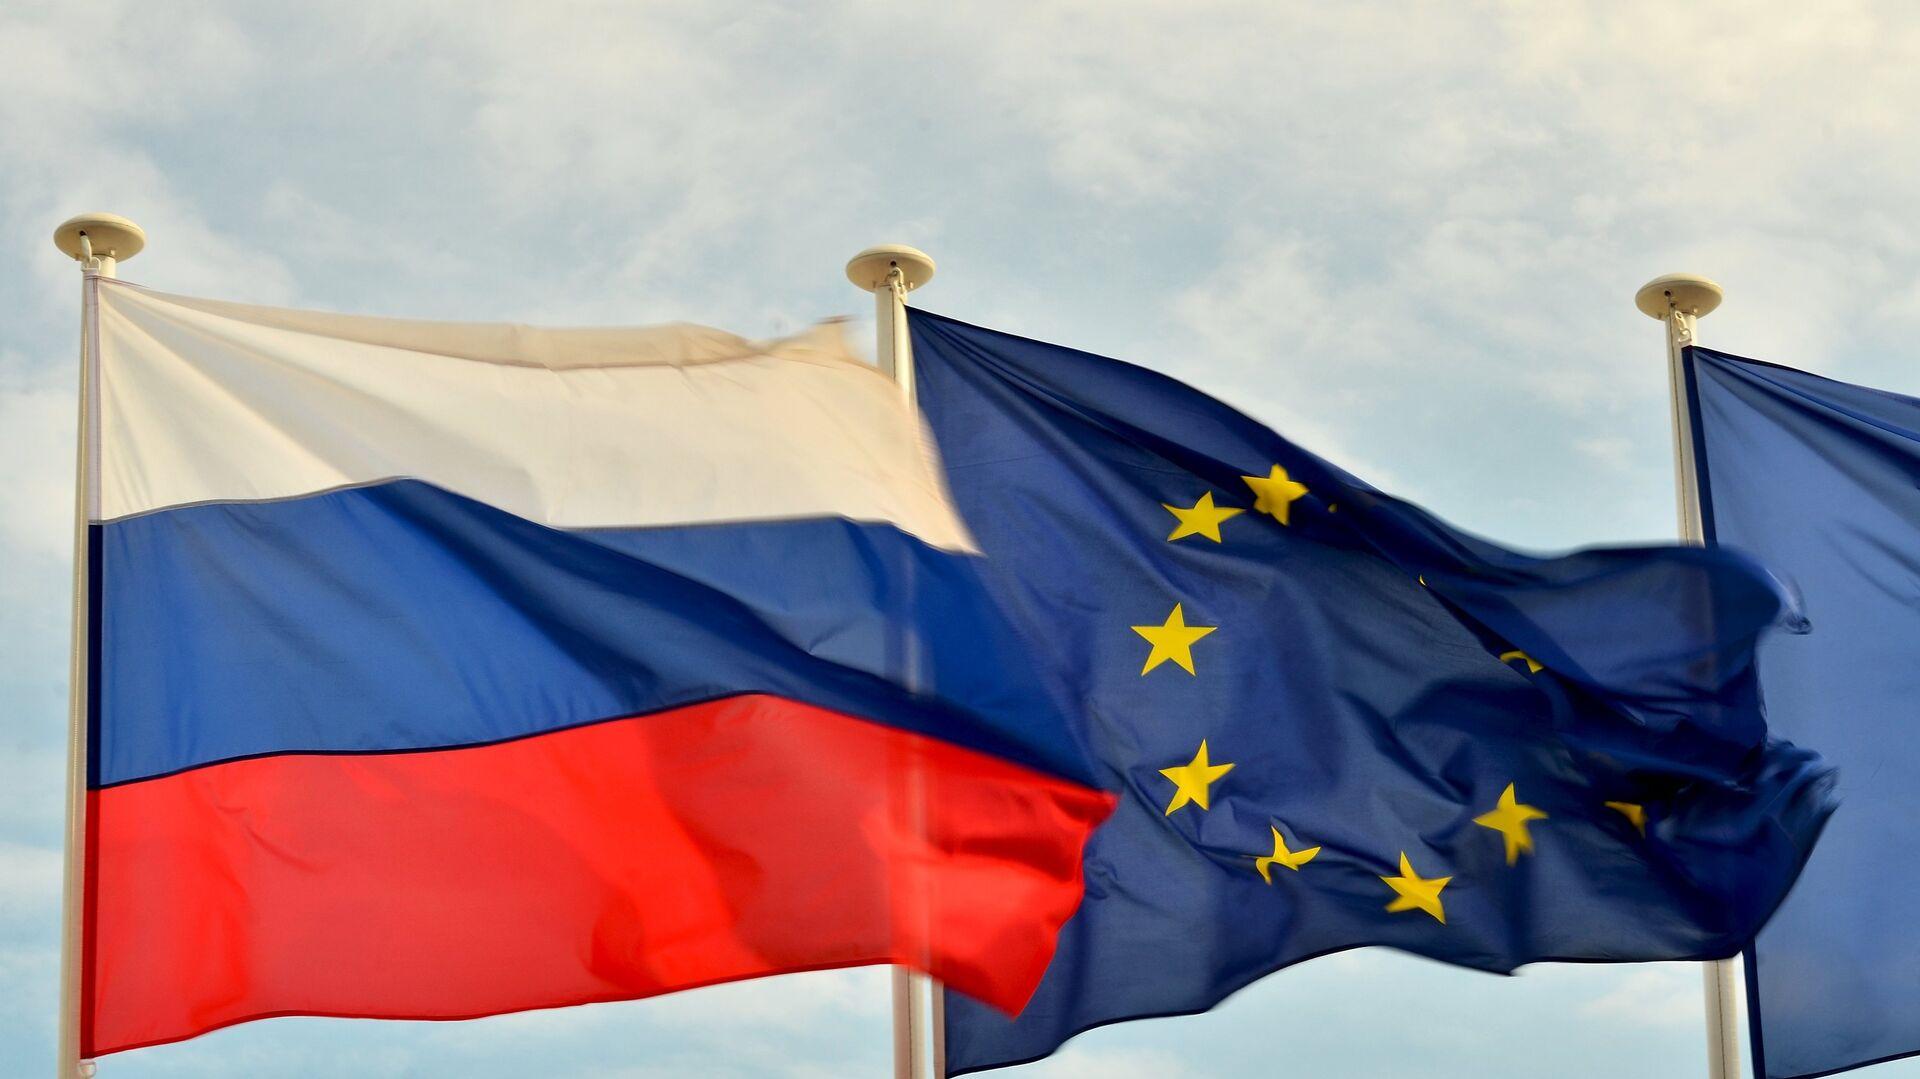 Flaga Rosji i UE - Sputnik Polska, 1920, 26.06.2021